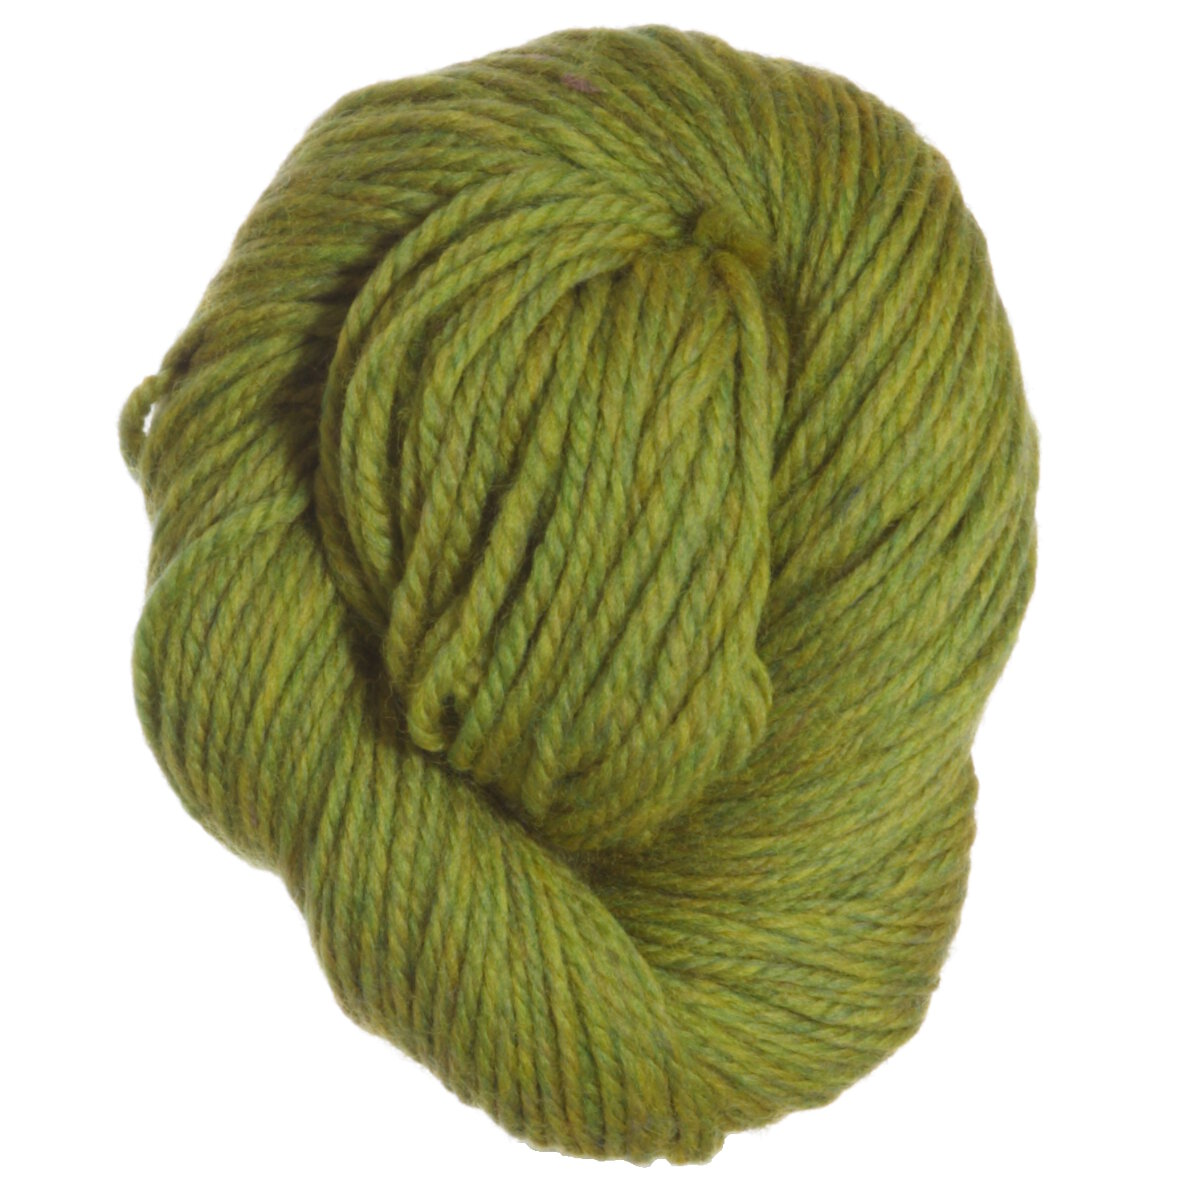 Aran Yarn : ... Palace Allegro Aran Yarn - 9059 Pea Pod Reviews at Jimmy Beans Wool